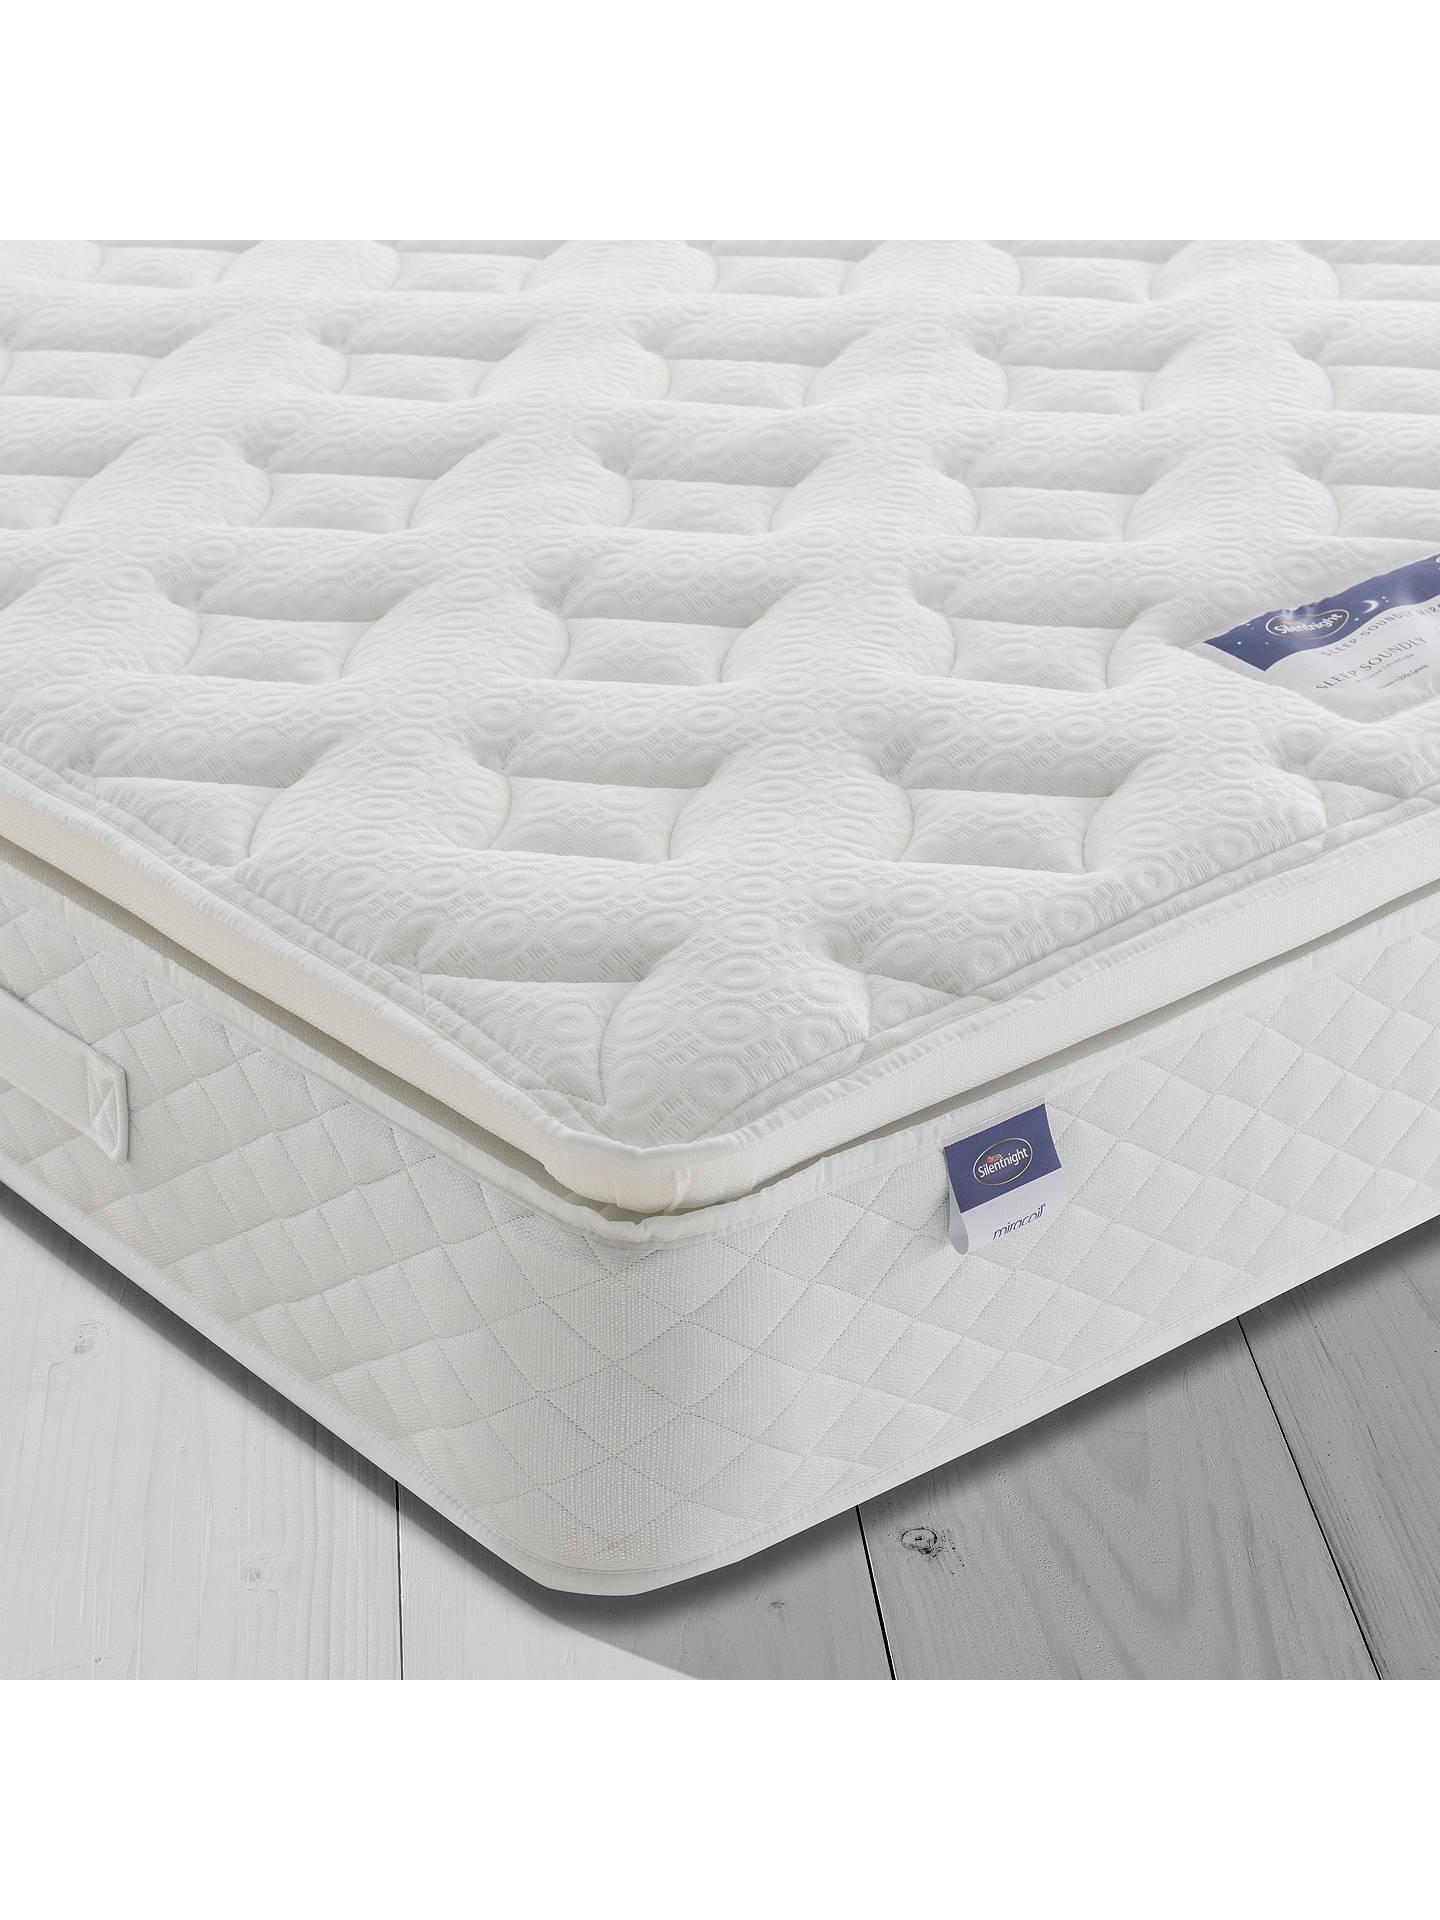 silentnight sleep soundly miracoil pillow top mattress. Black Bedroom Furniture Sets. Home Design Ideas